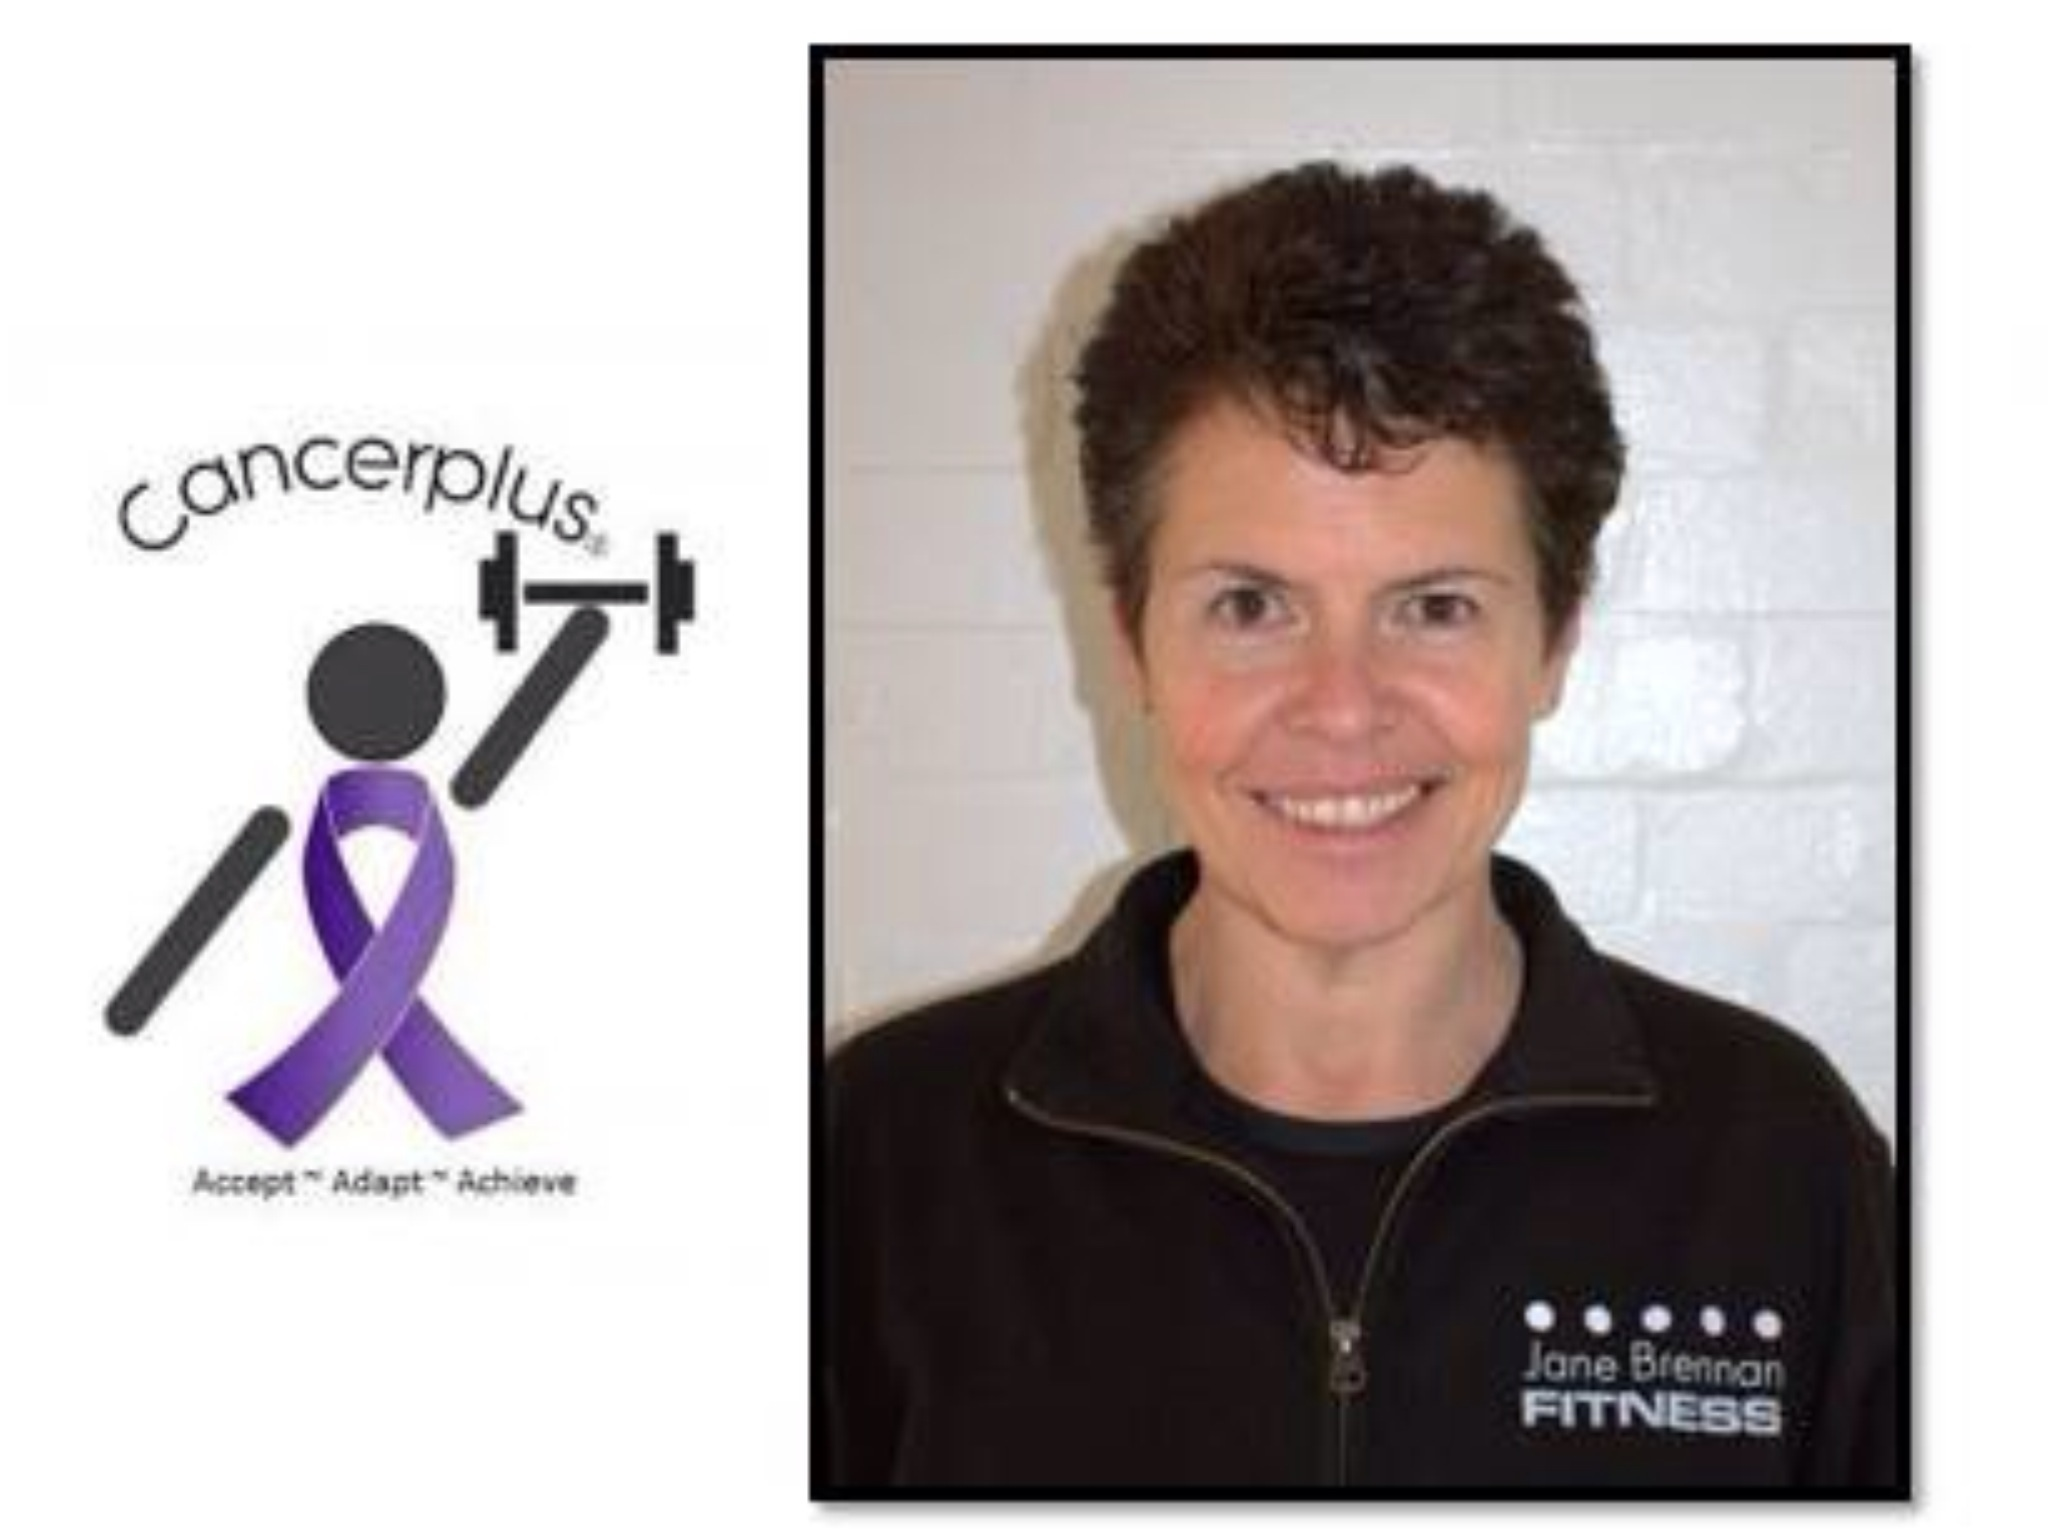 Jane Brennan Profile Picture